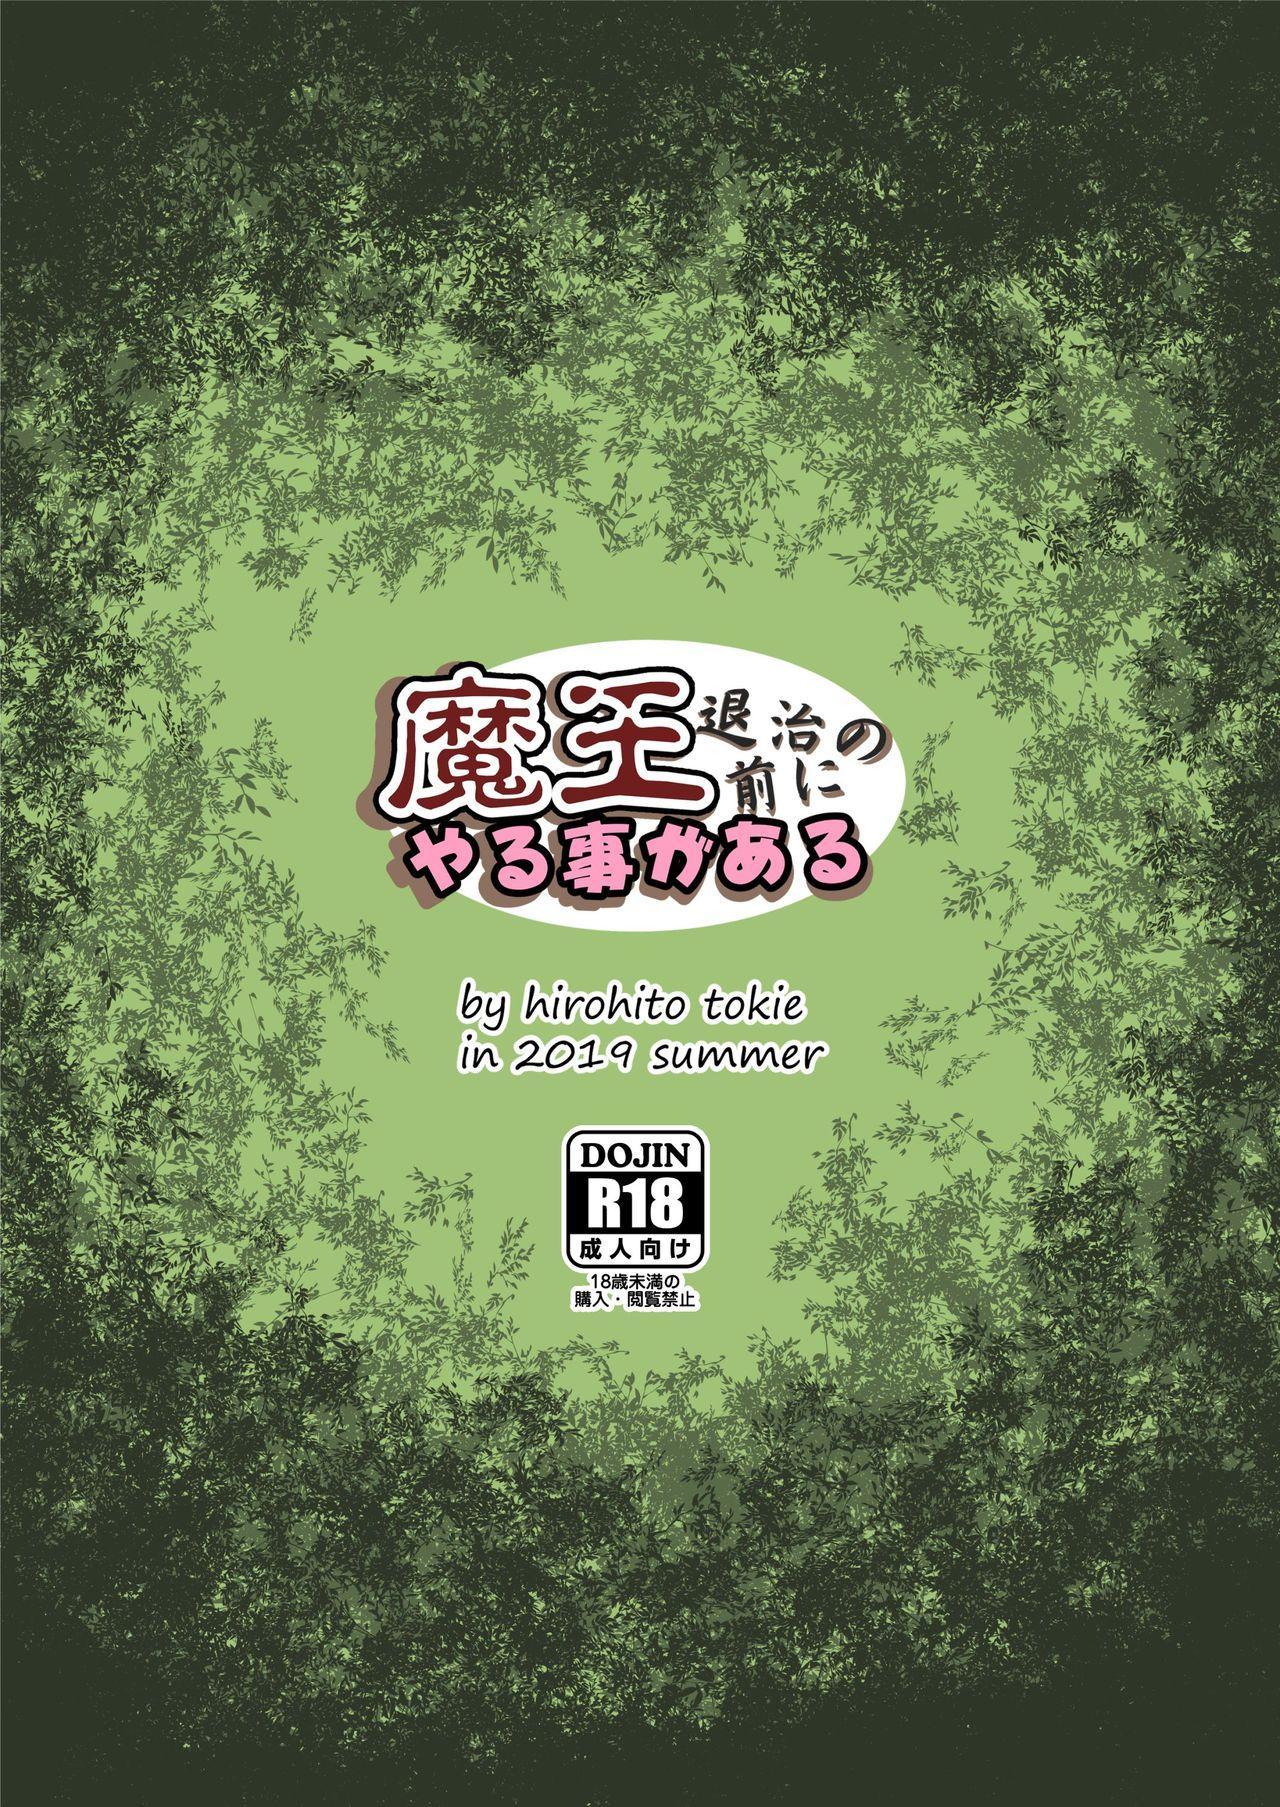 Maou Taiji no Mae ni Yaru Koto ga Aru | Things To Do Before Defeating The Demon Lord 21